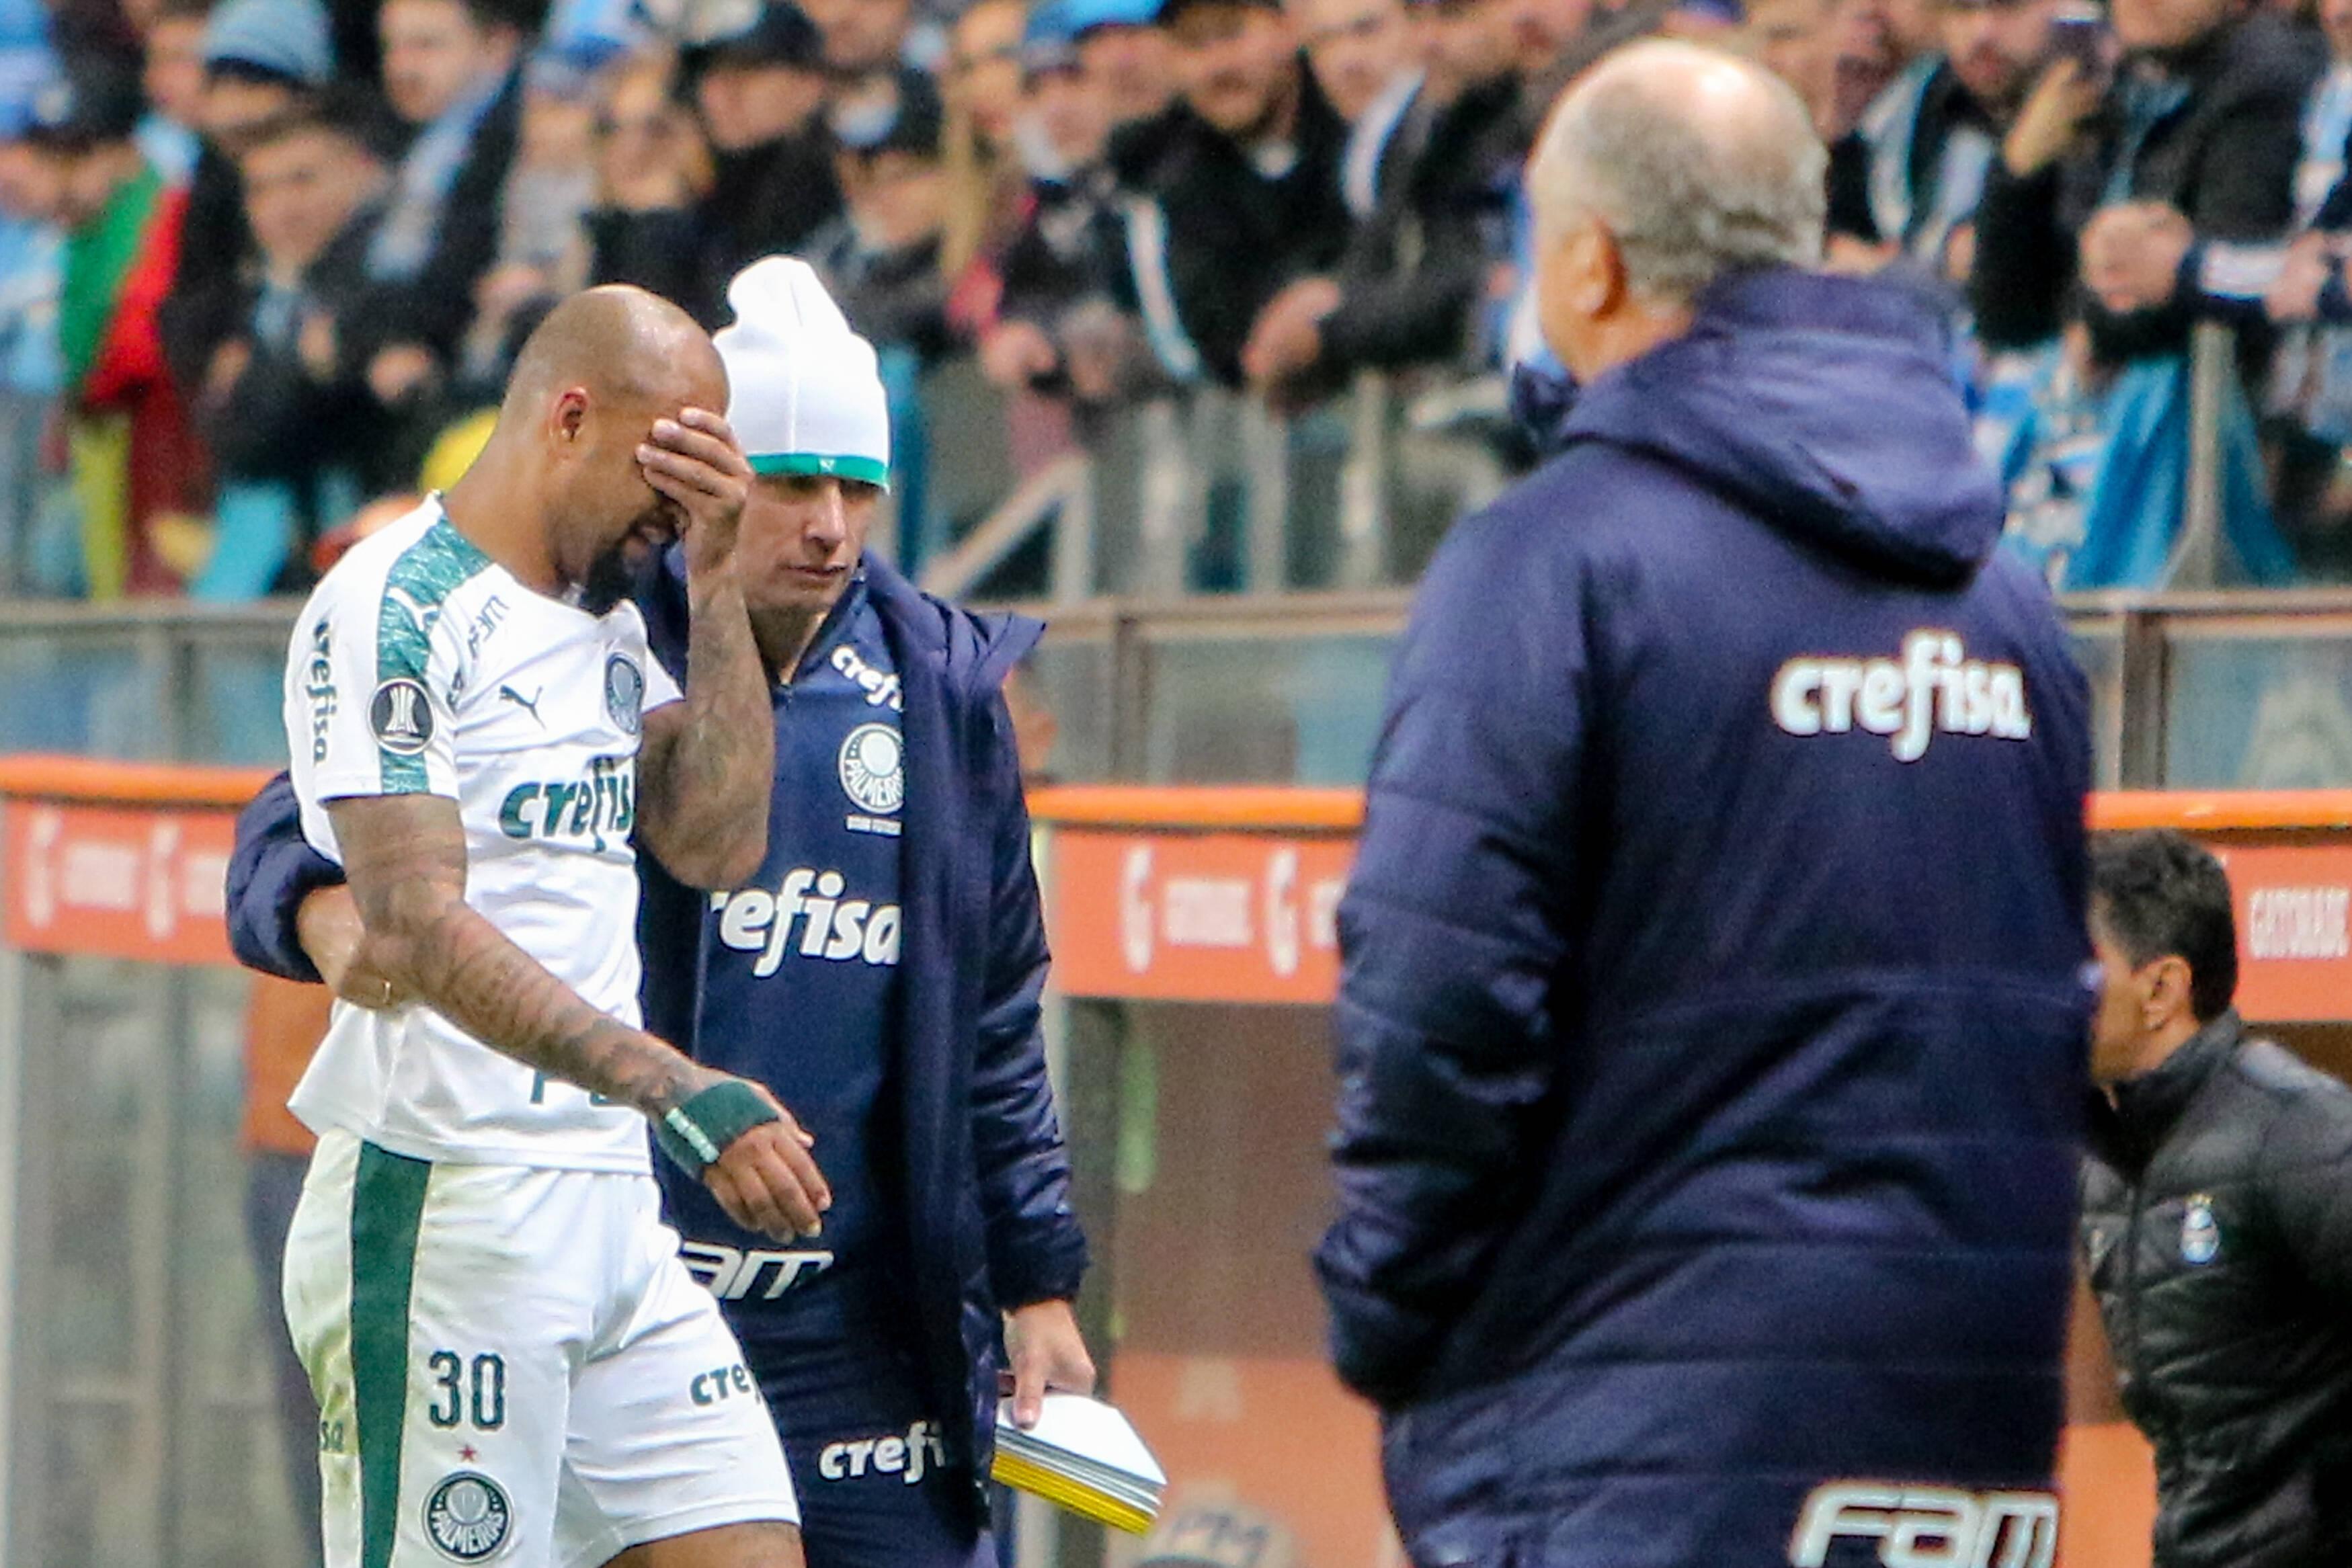 Foto: Everton Pereira / Ofotográfico / Agência O Globo